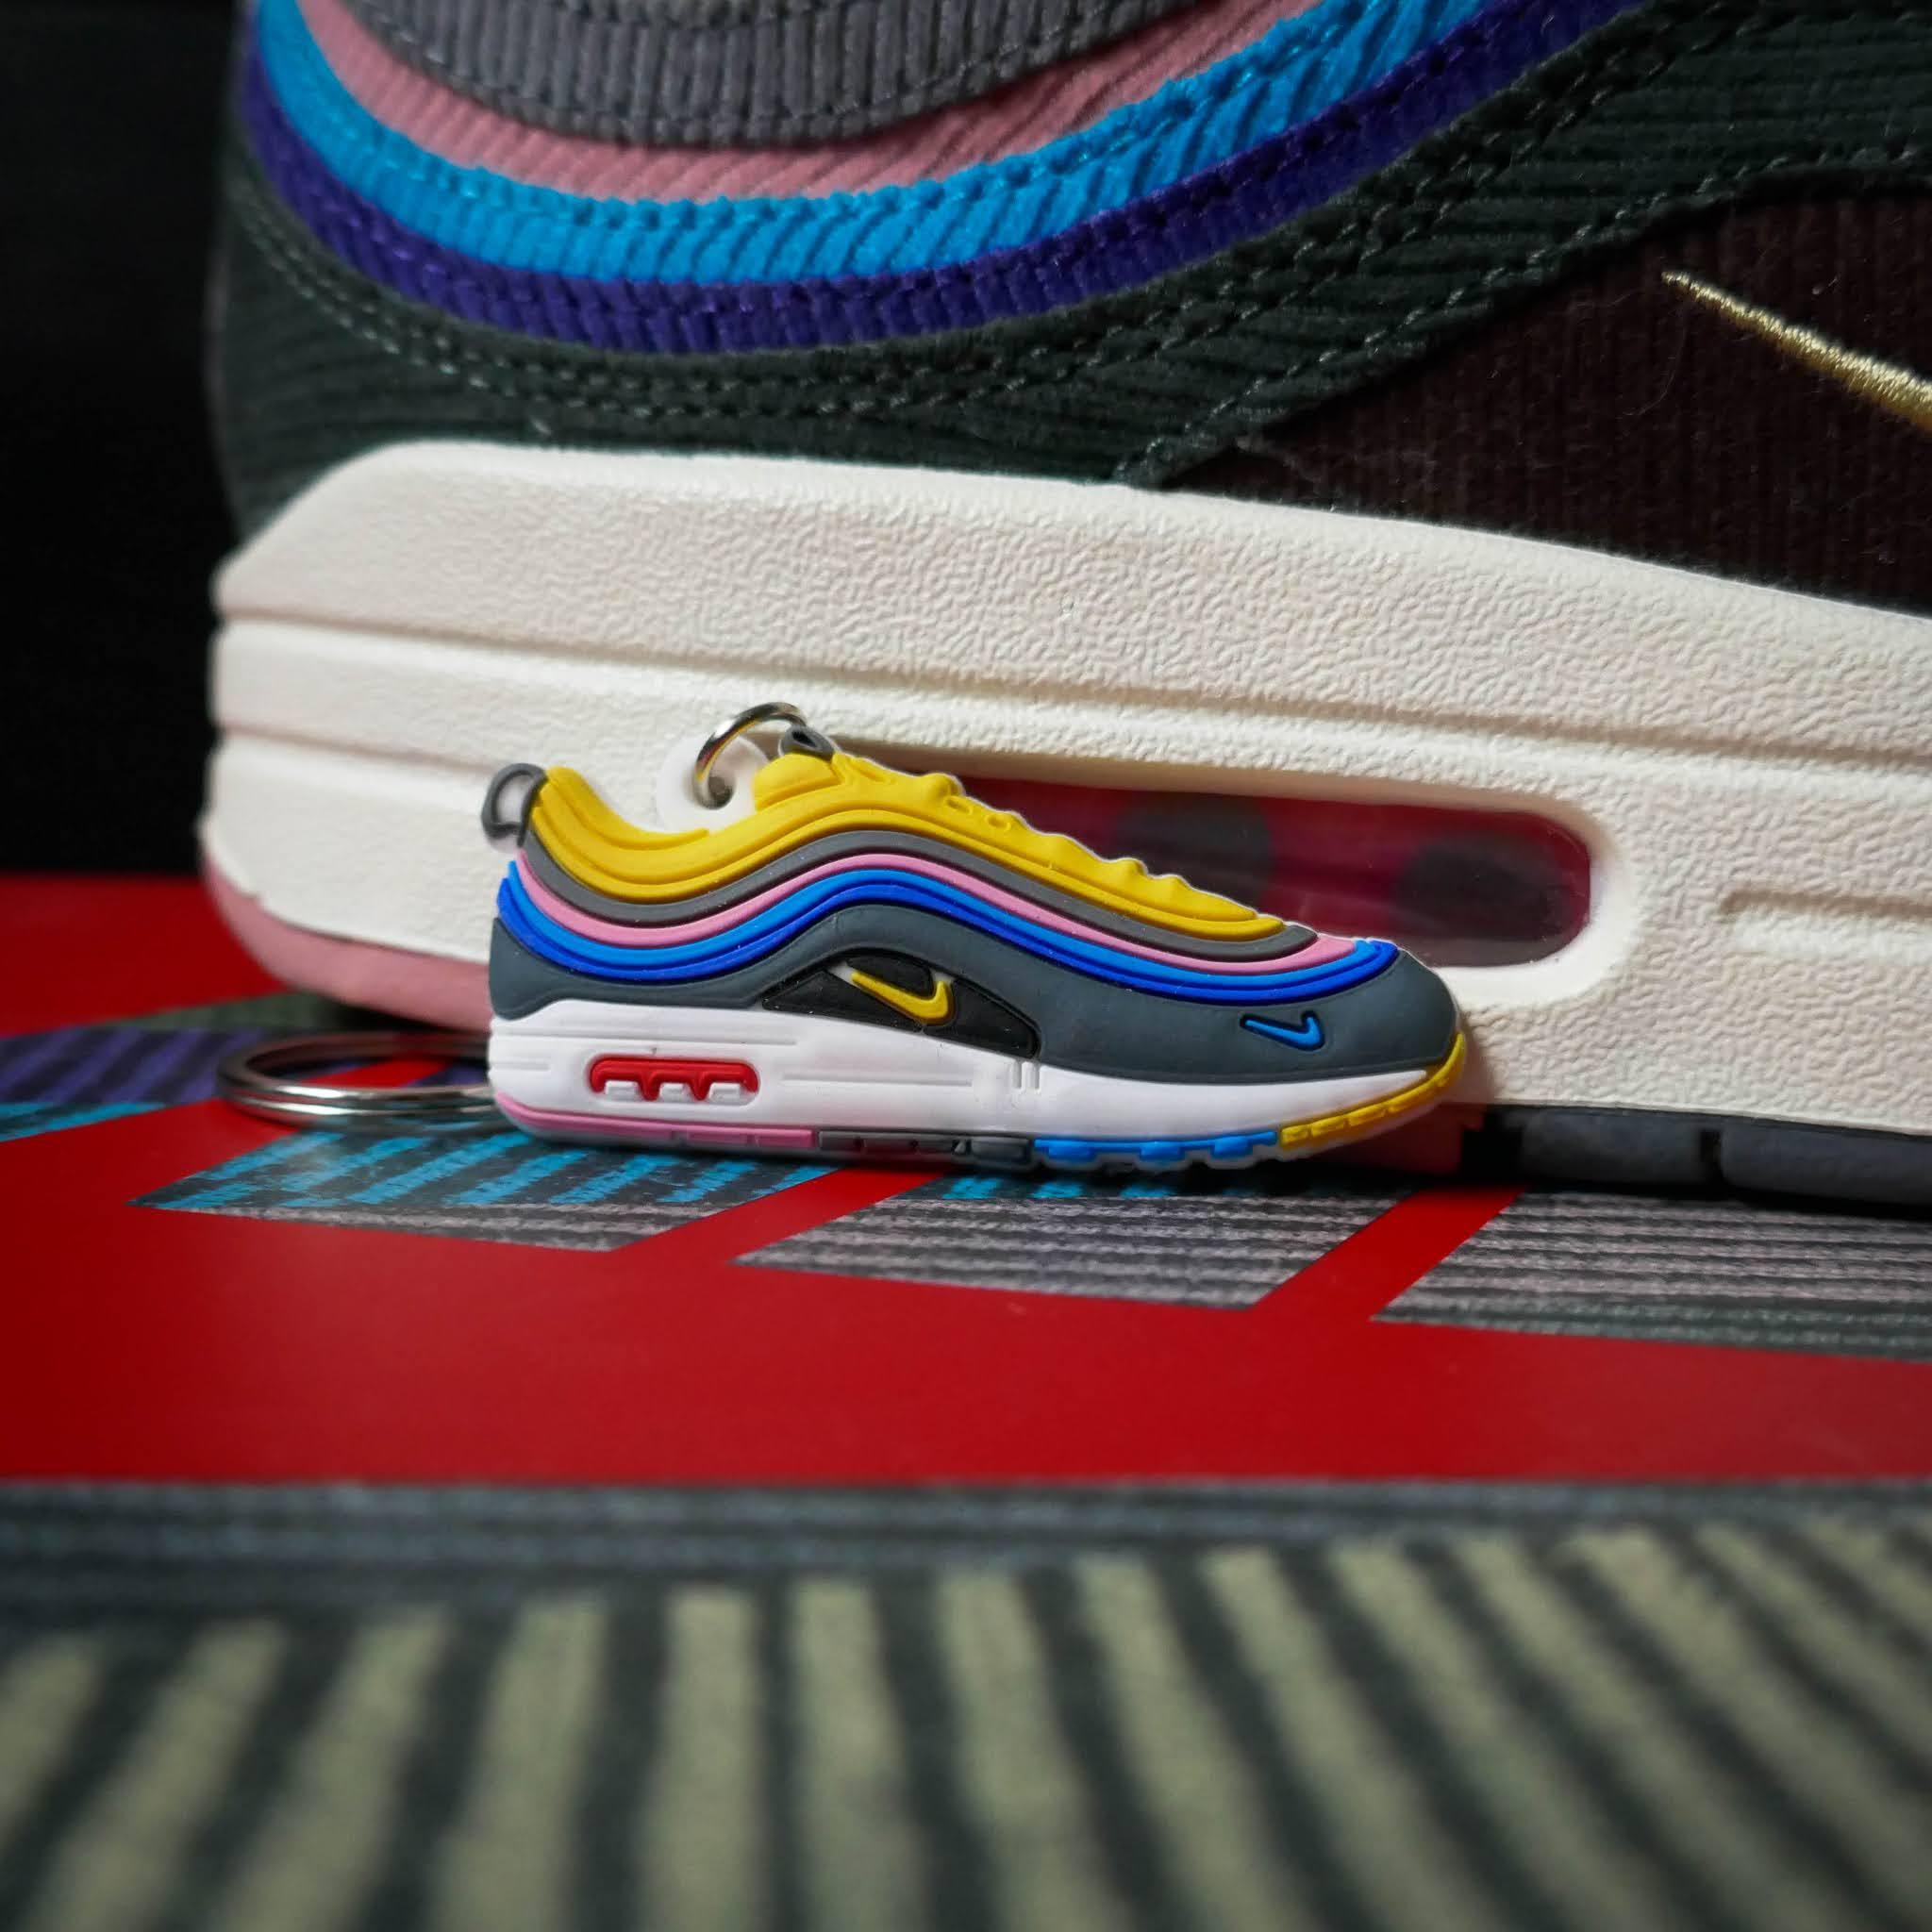 Idée cadeau : Le porte-clé sneakers   Joanna   Style de Nana